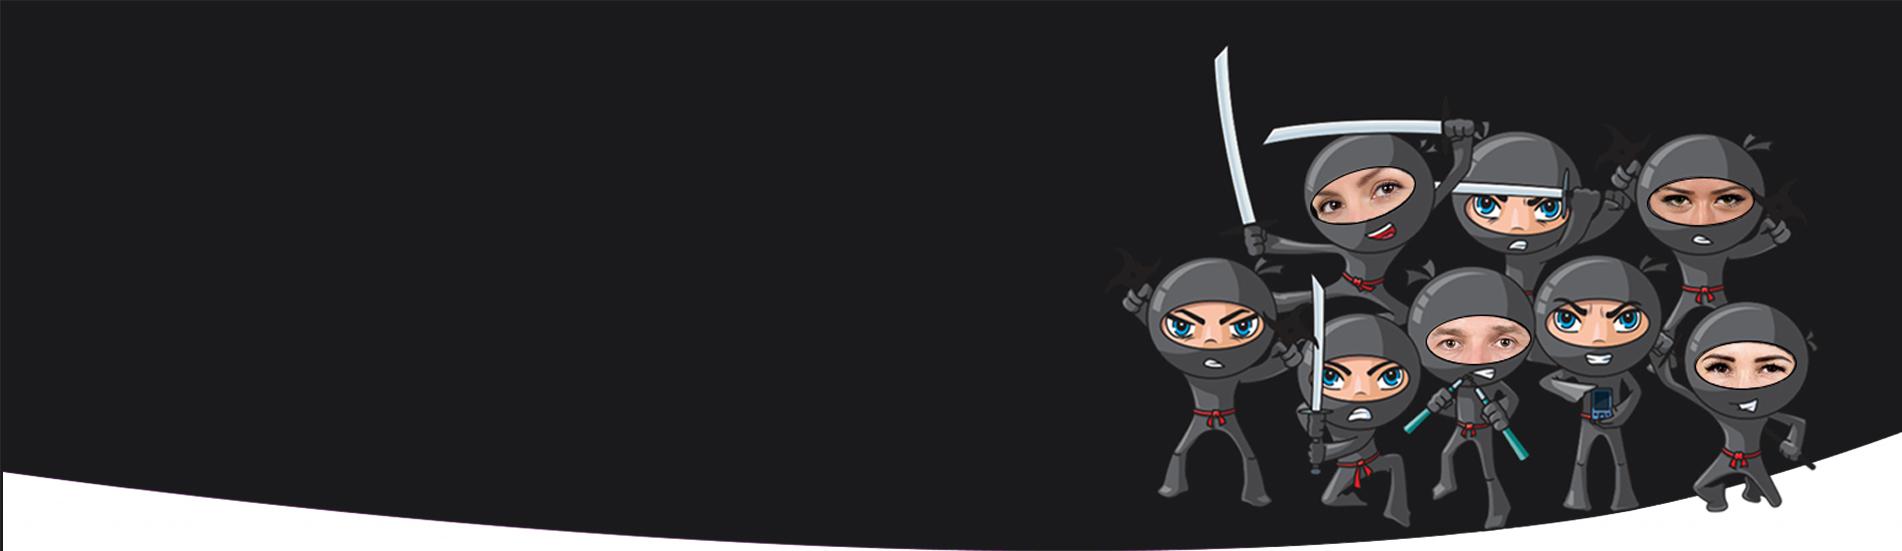 Ninja-főoldal-slider-kép